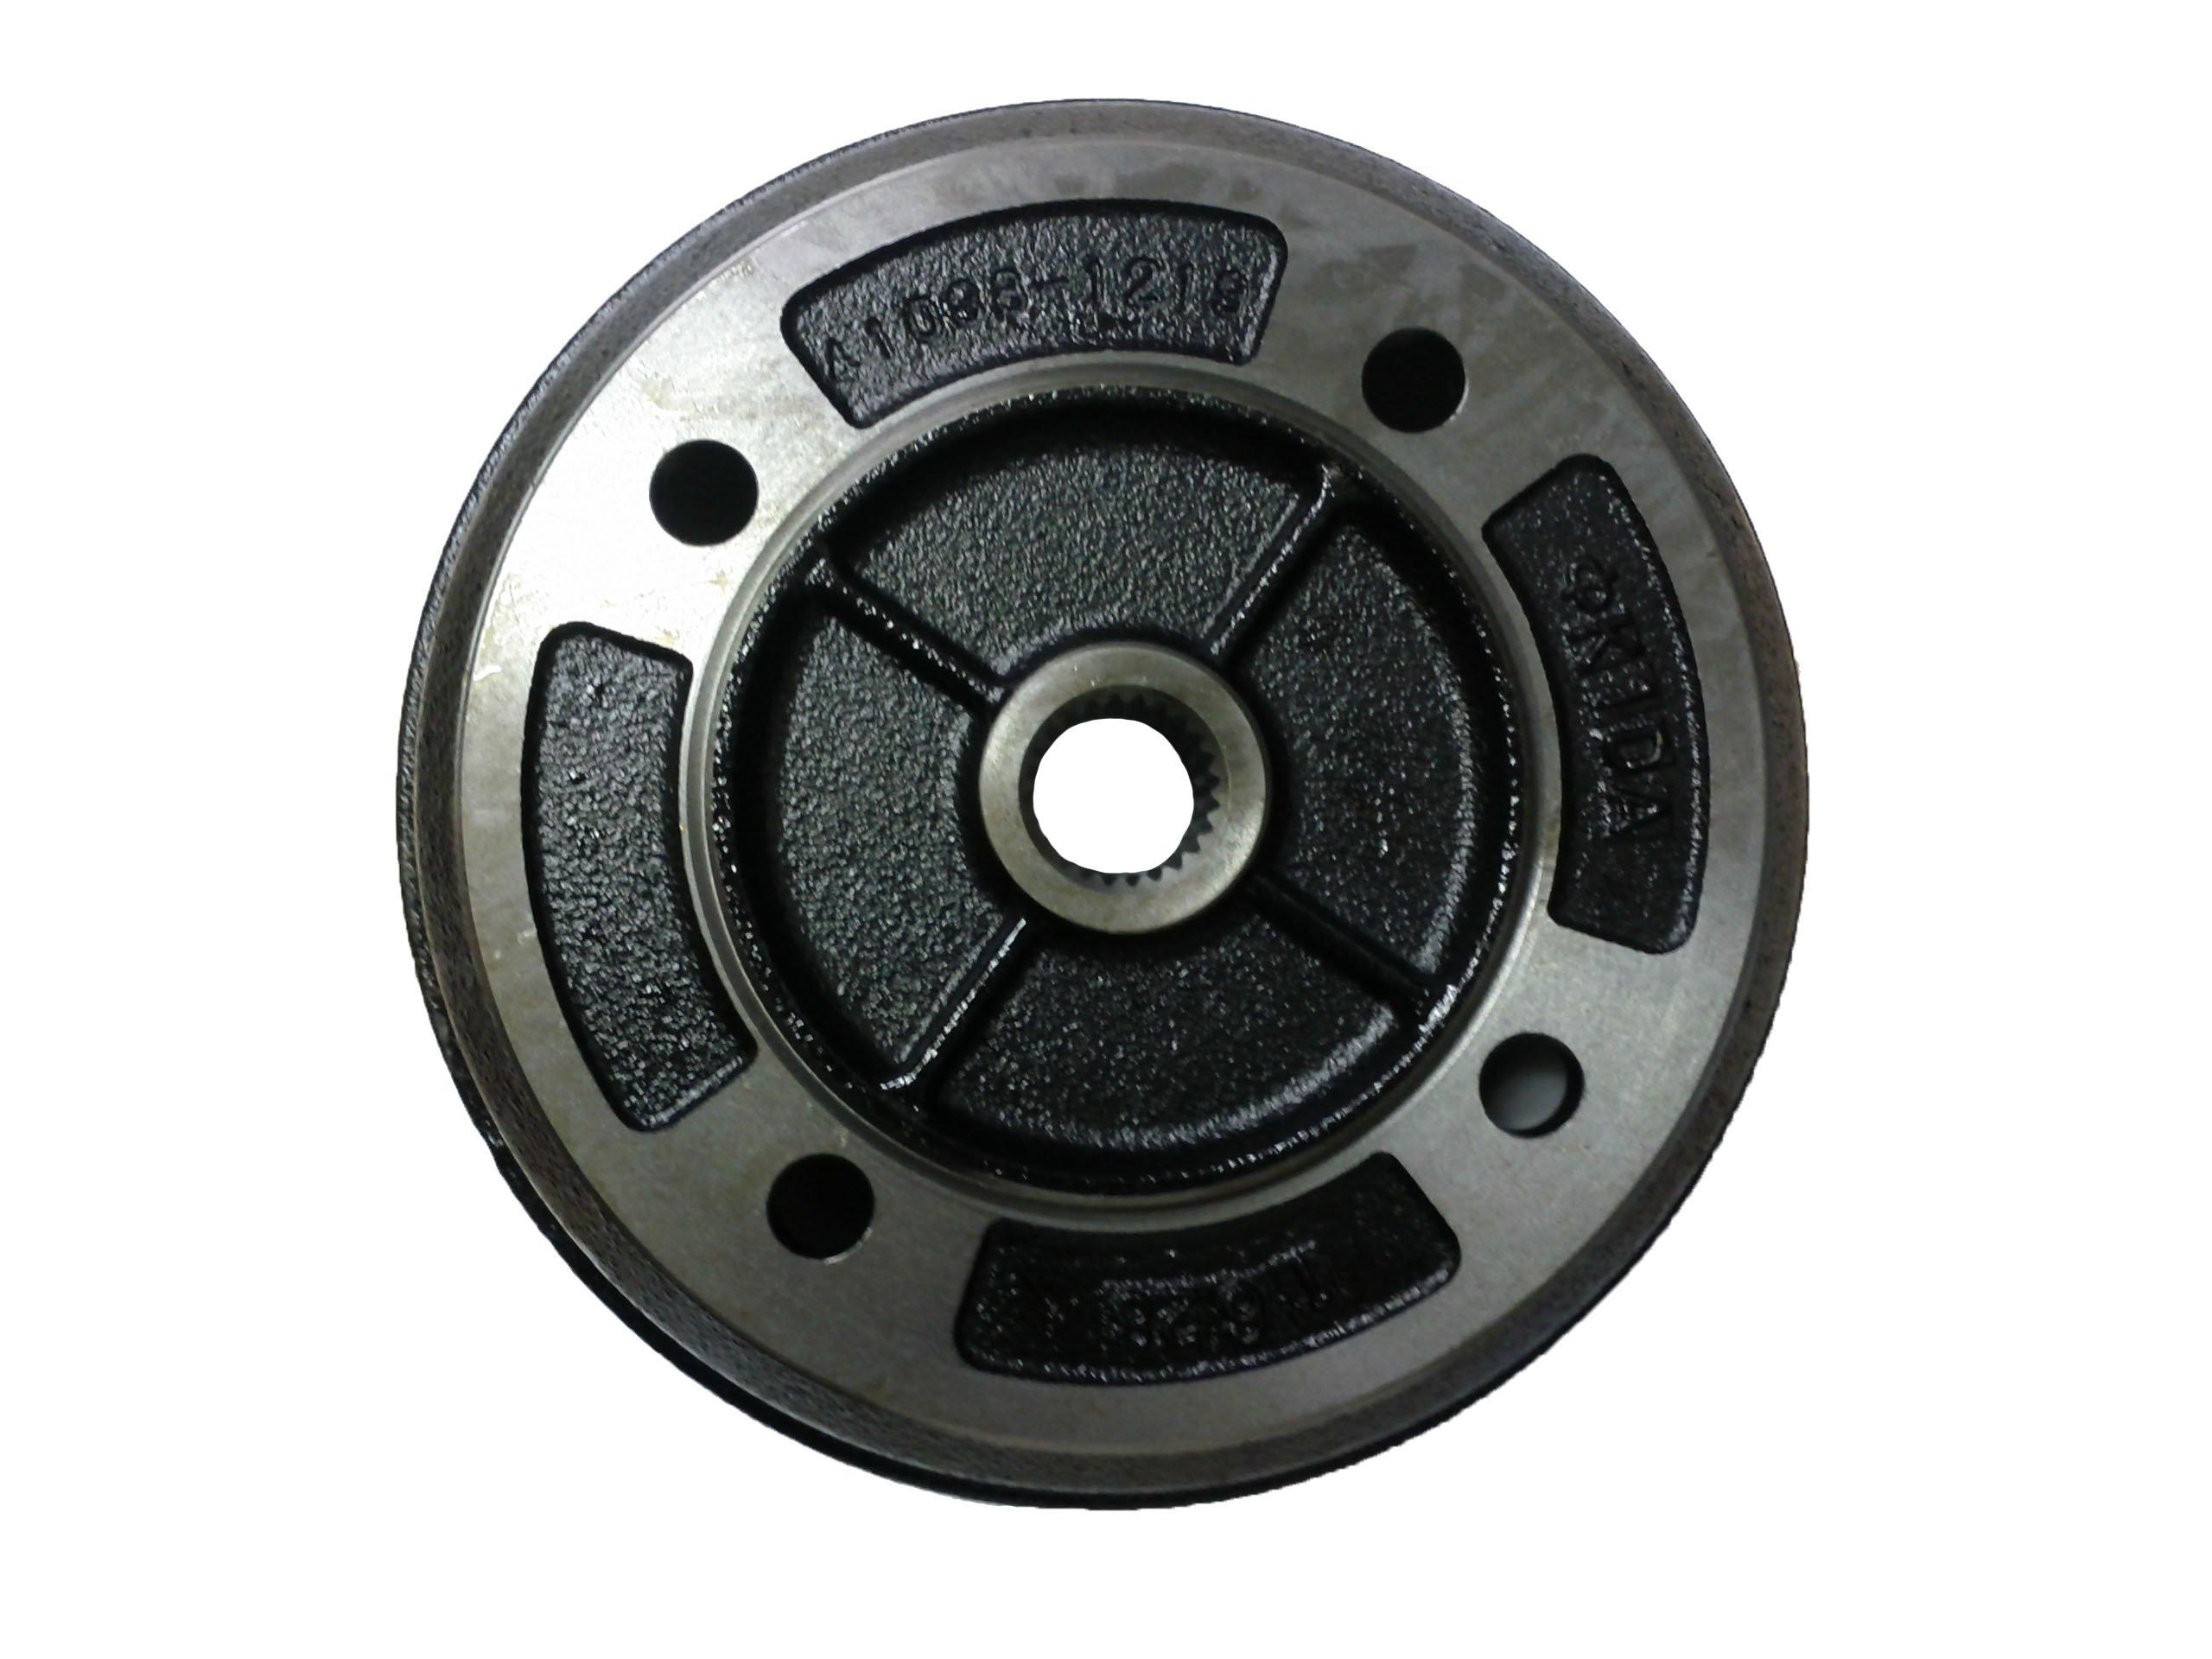 Kawasaki Mule 3000 3010 Rear Brake Drum Wheel Hub KAF620 41038-1336